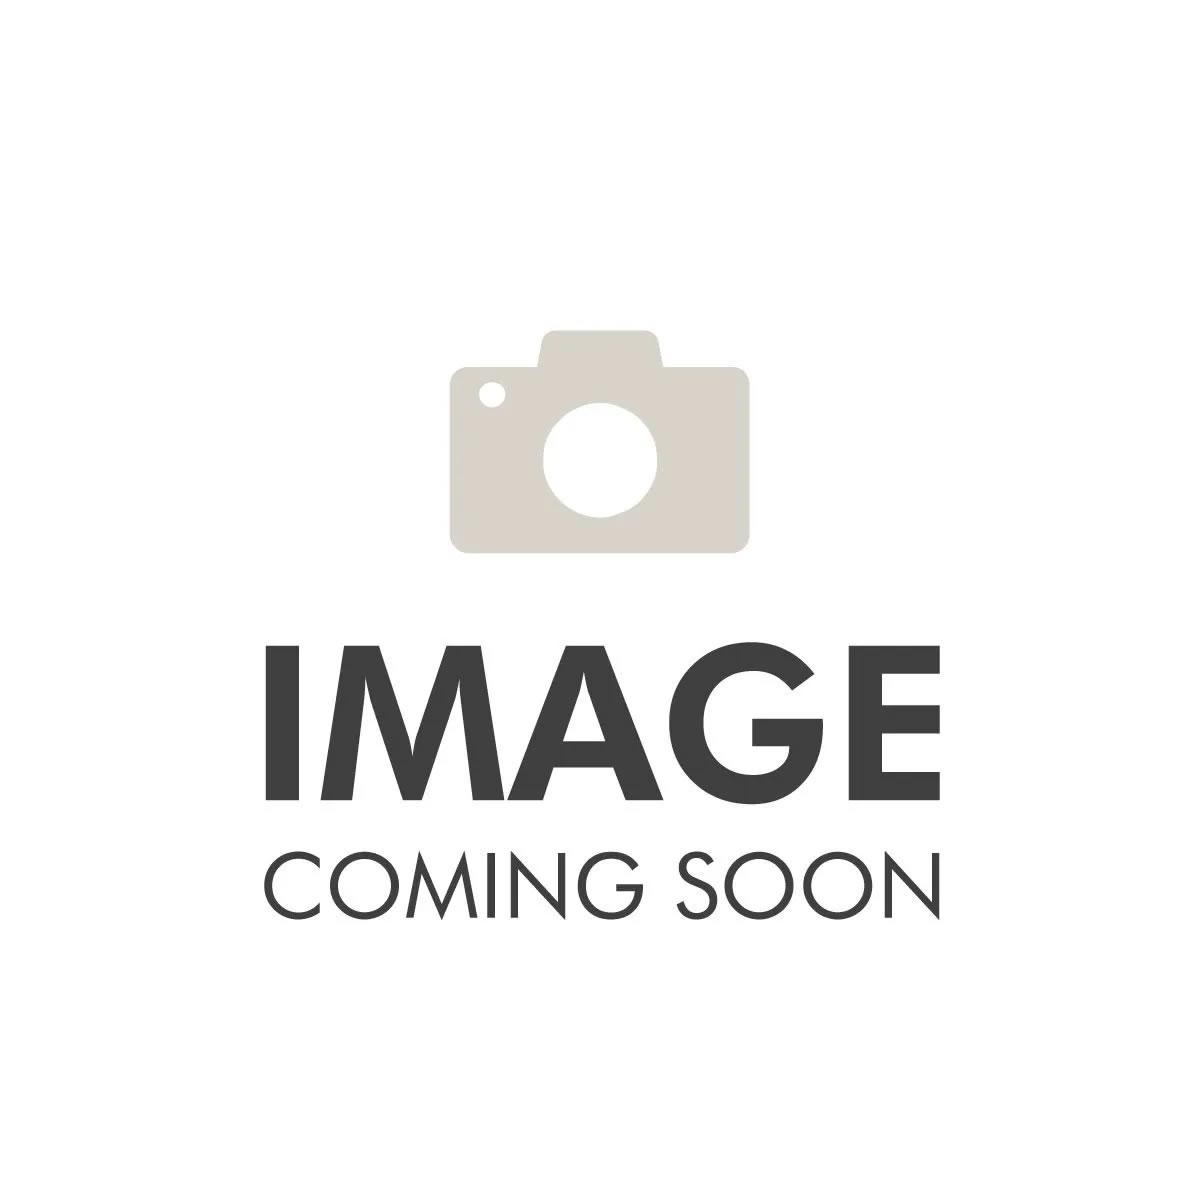 Acoustic Island Topper Soft Top, Black Denim; 97-06 Jeep Wrangler TJ